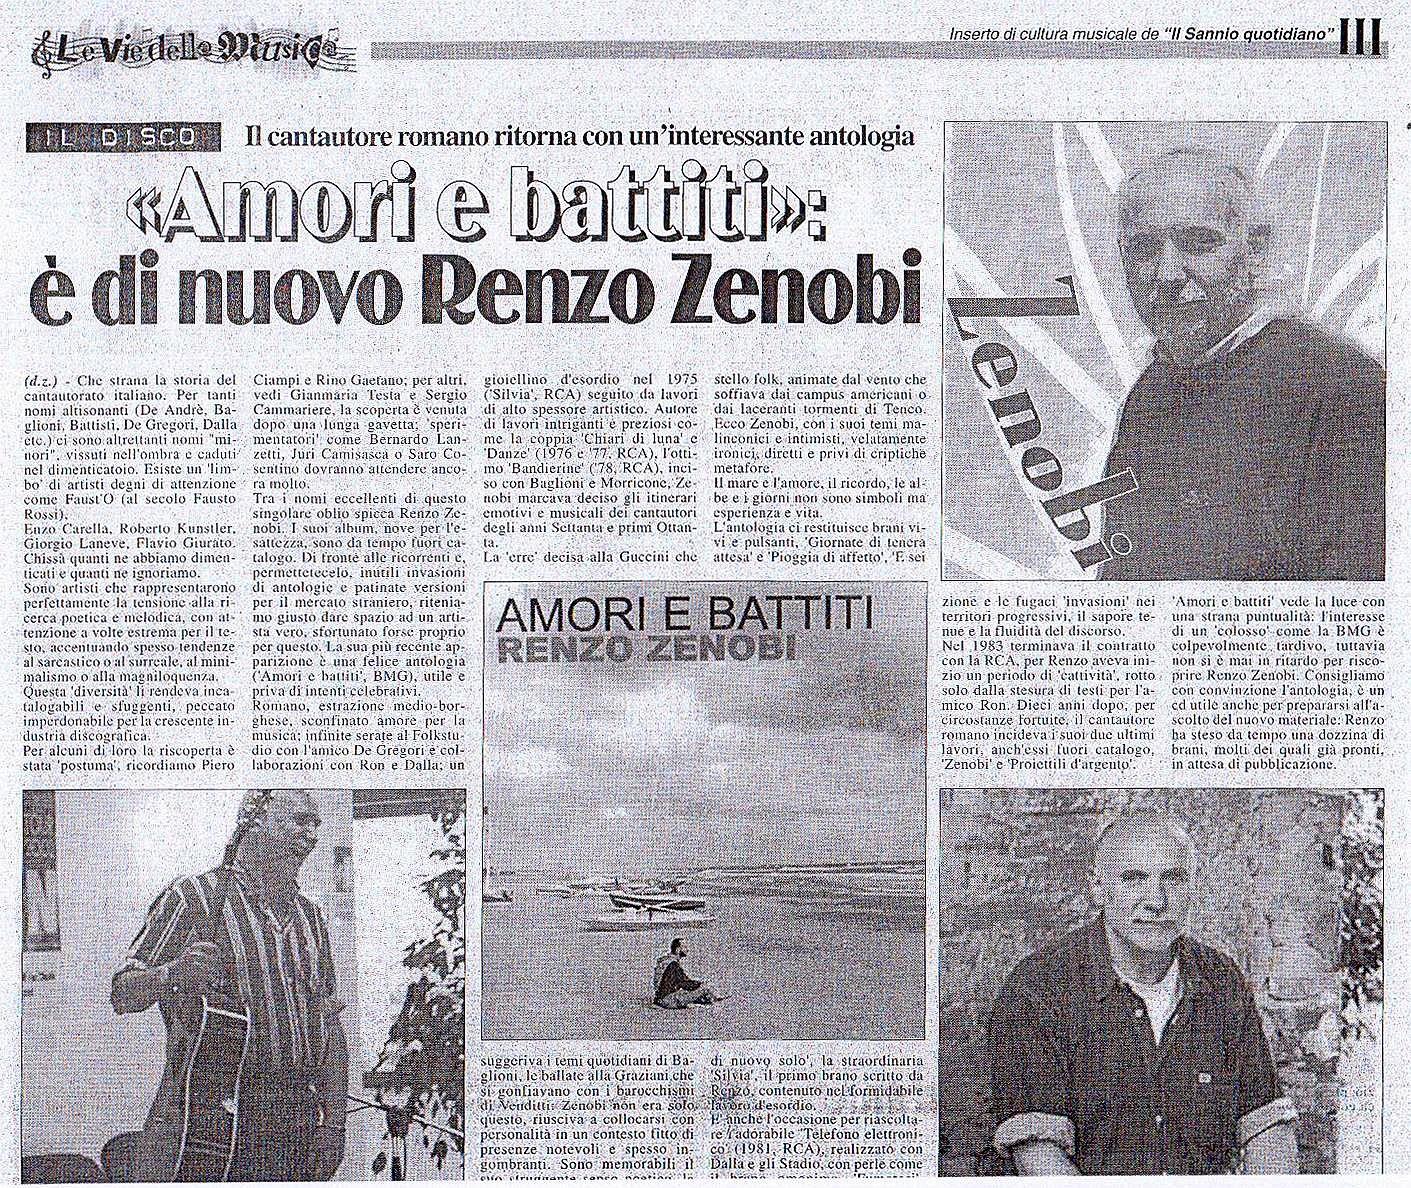 VDM 14 marzo 2003 Zenobi